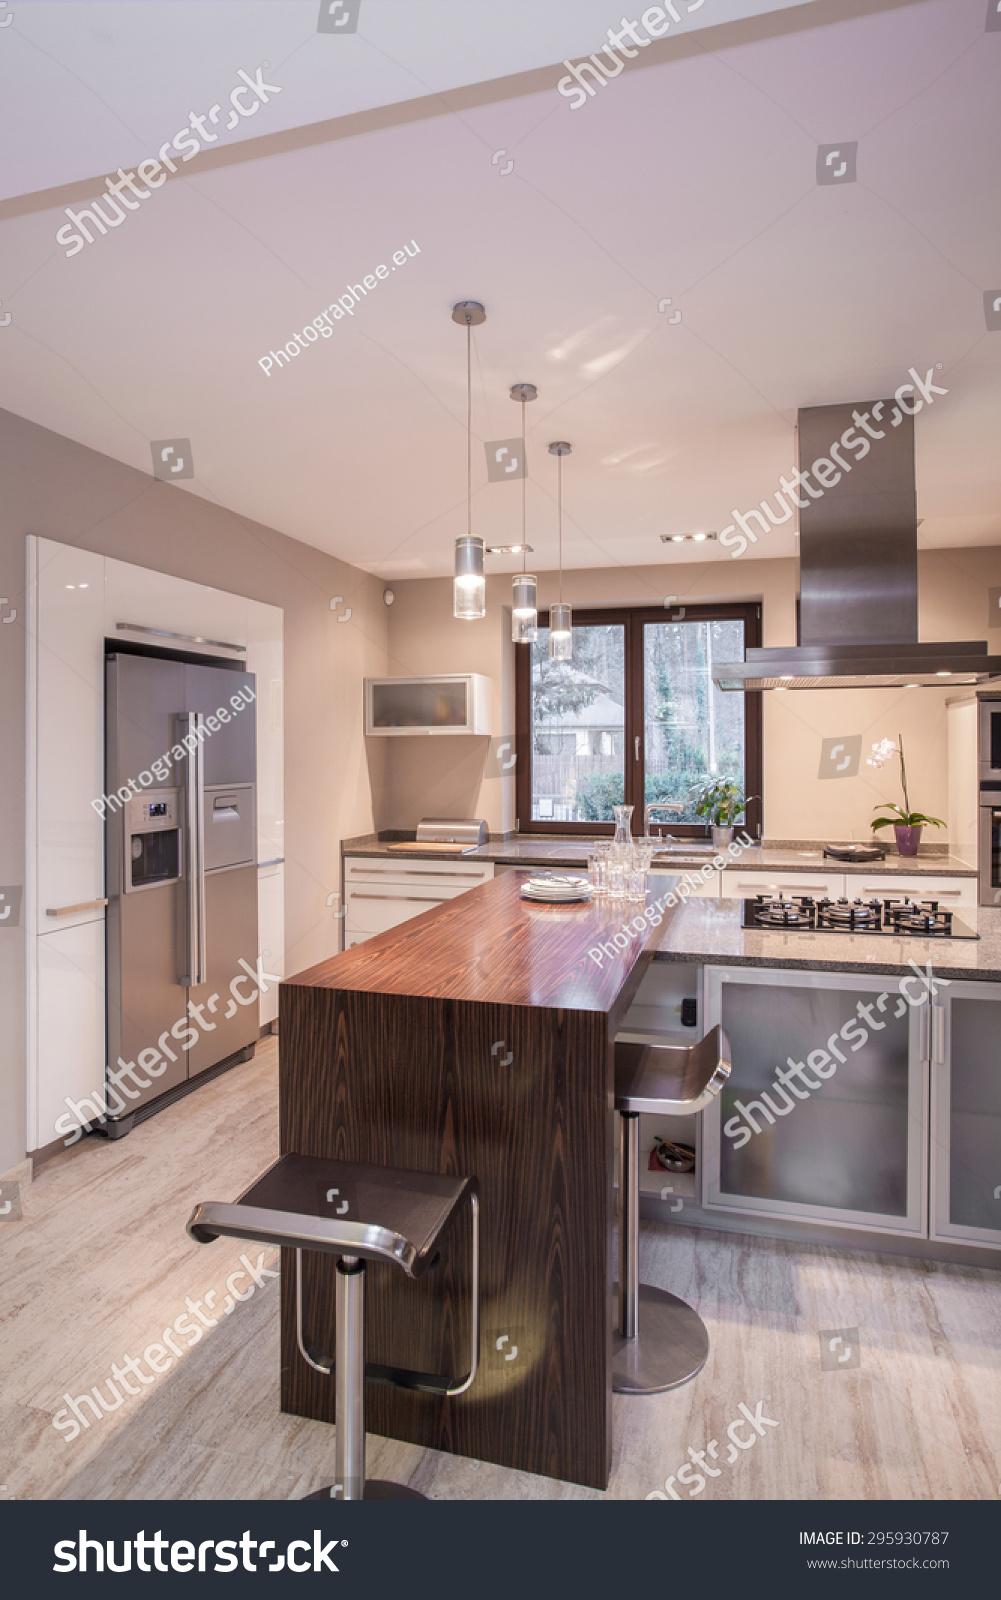 Vertical View Luxury Modern Kitchen Design  Interiors Stock Image